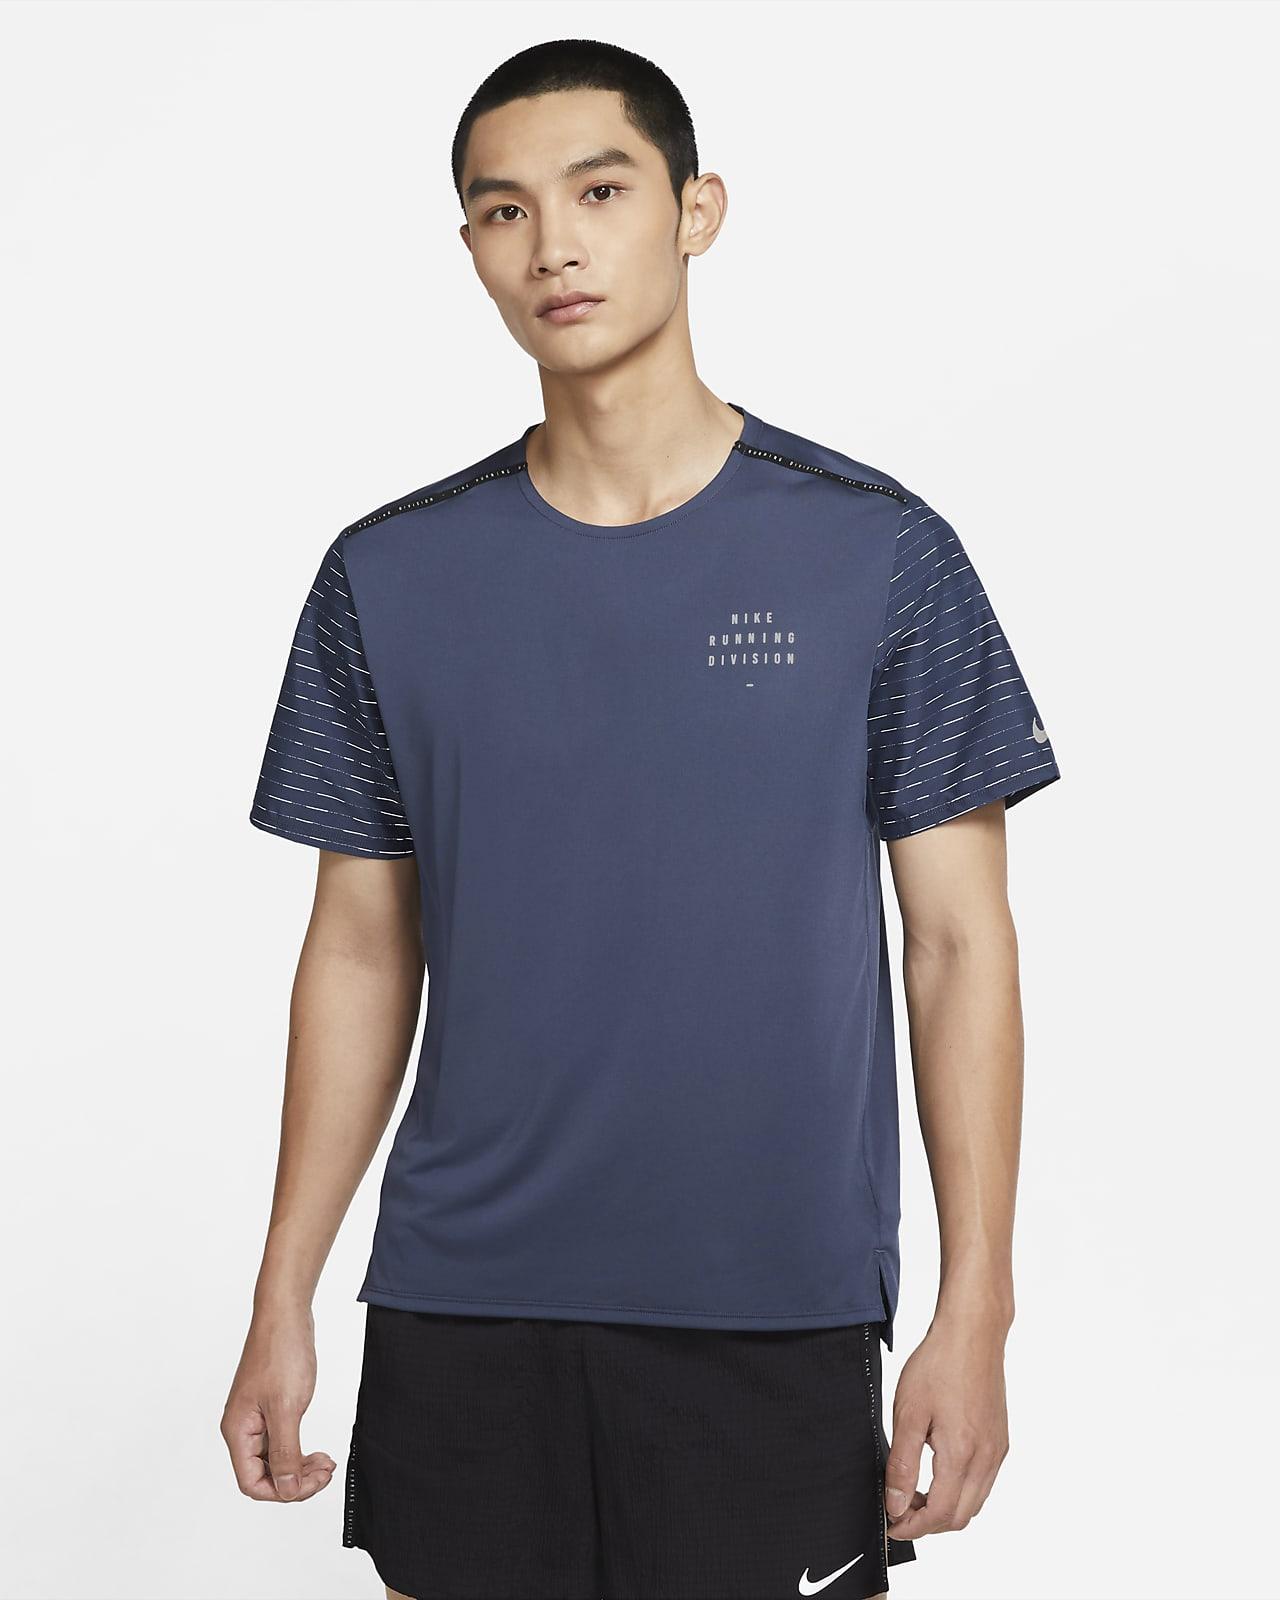 Nike Dri-FIT Rise 365 Run Division Men's Short-Sleeve Running Top